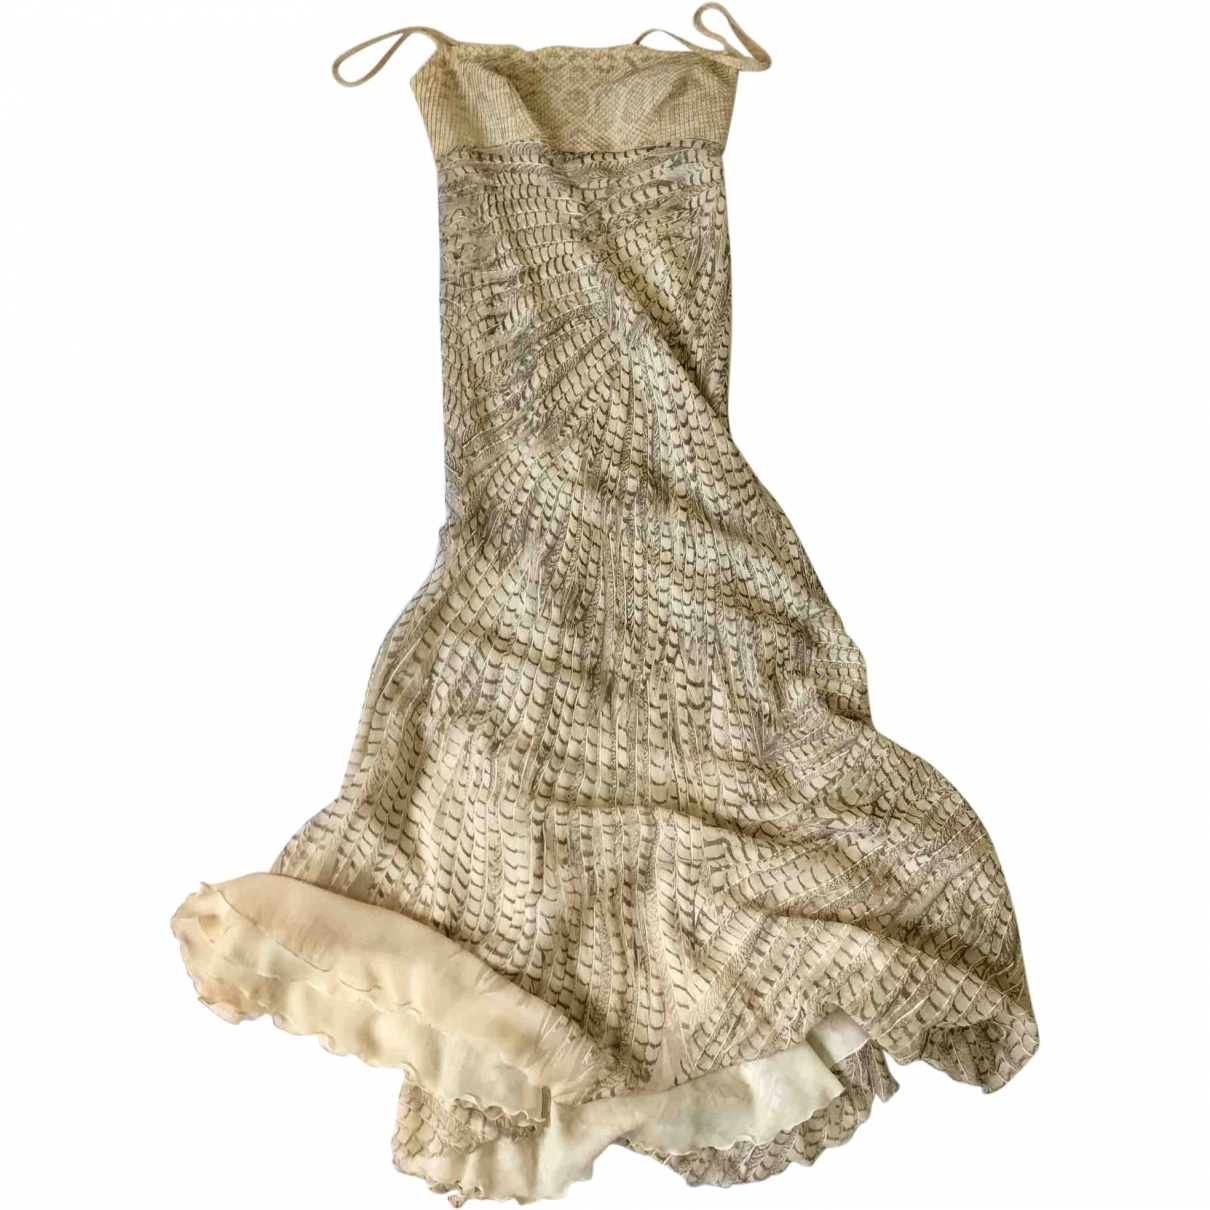 Roberto Cavalli \N Beige Silk dress for Women S International